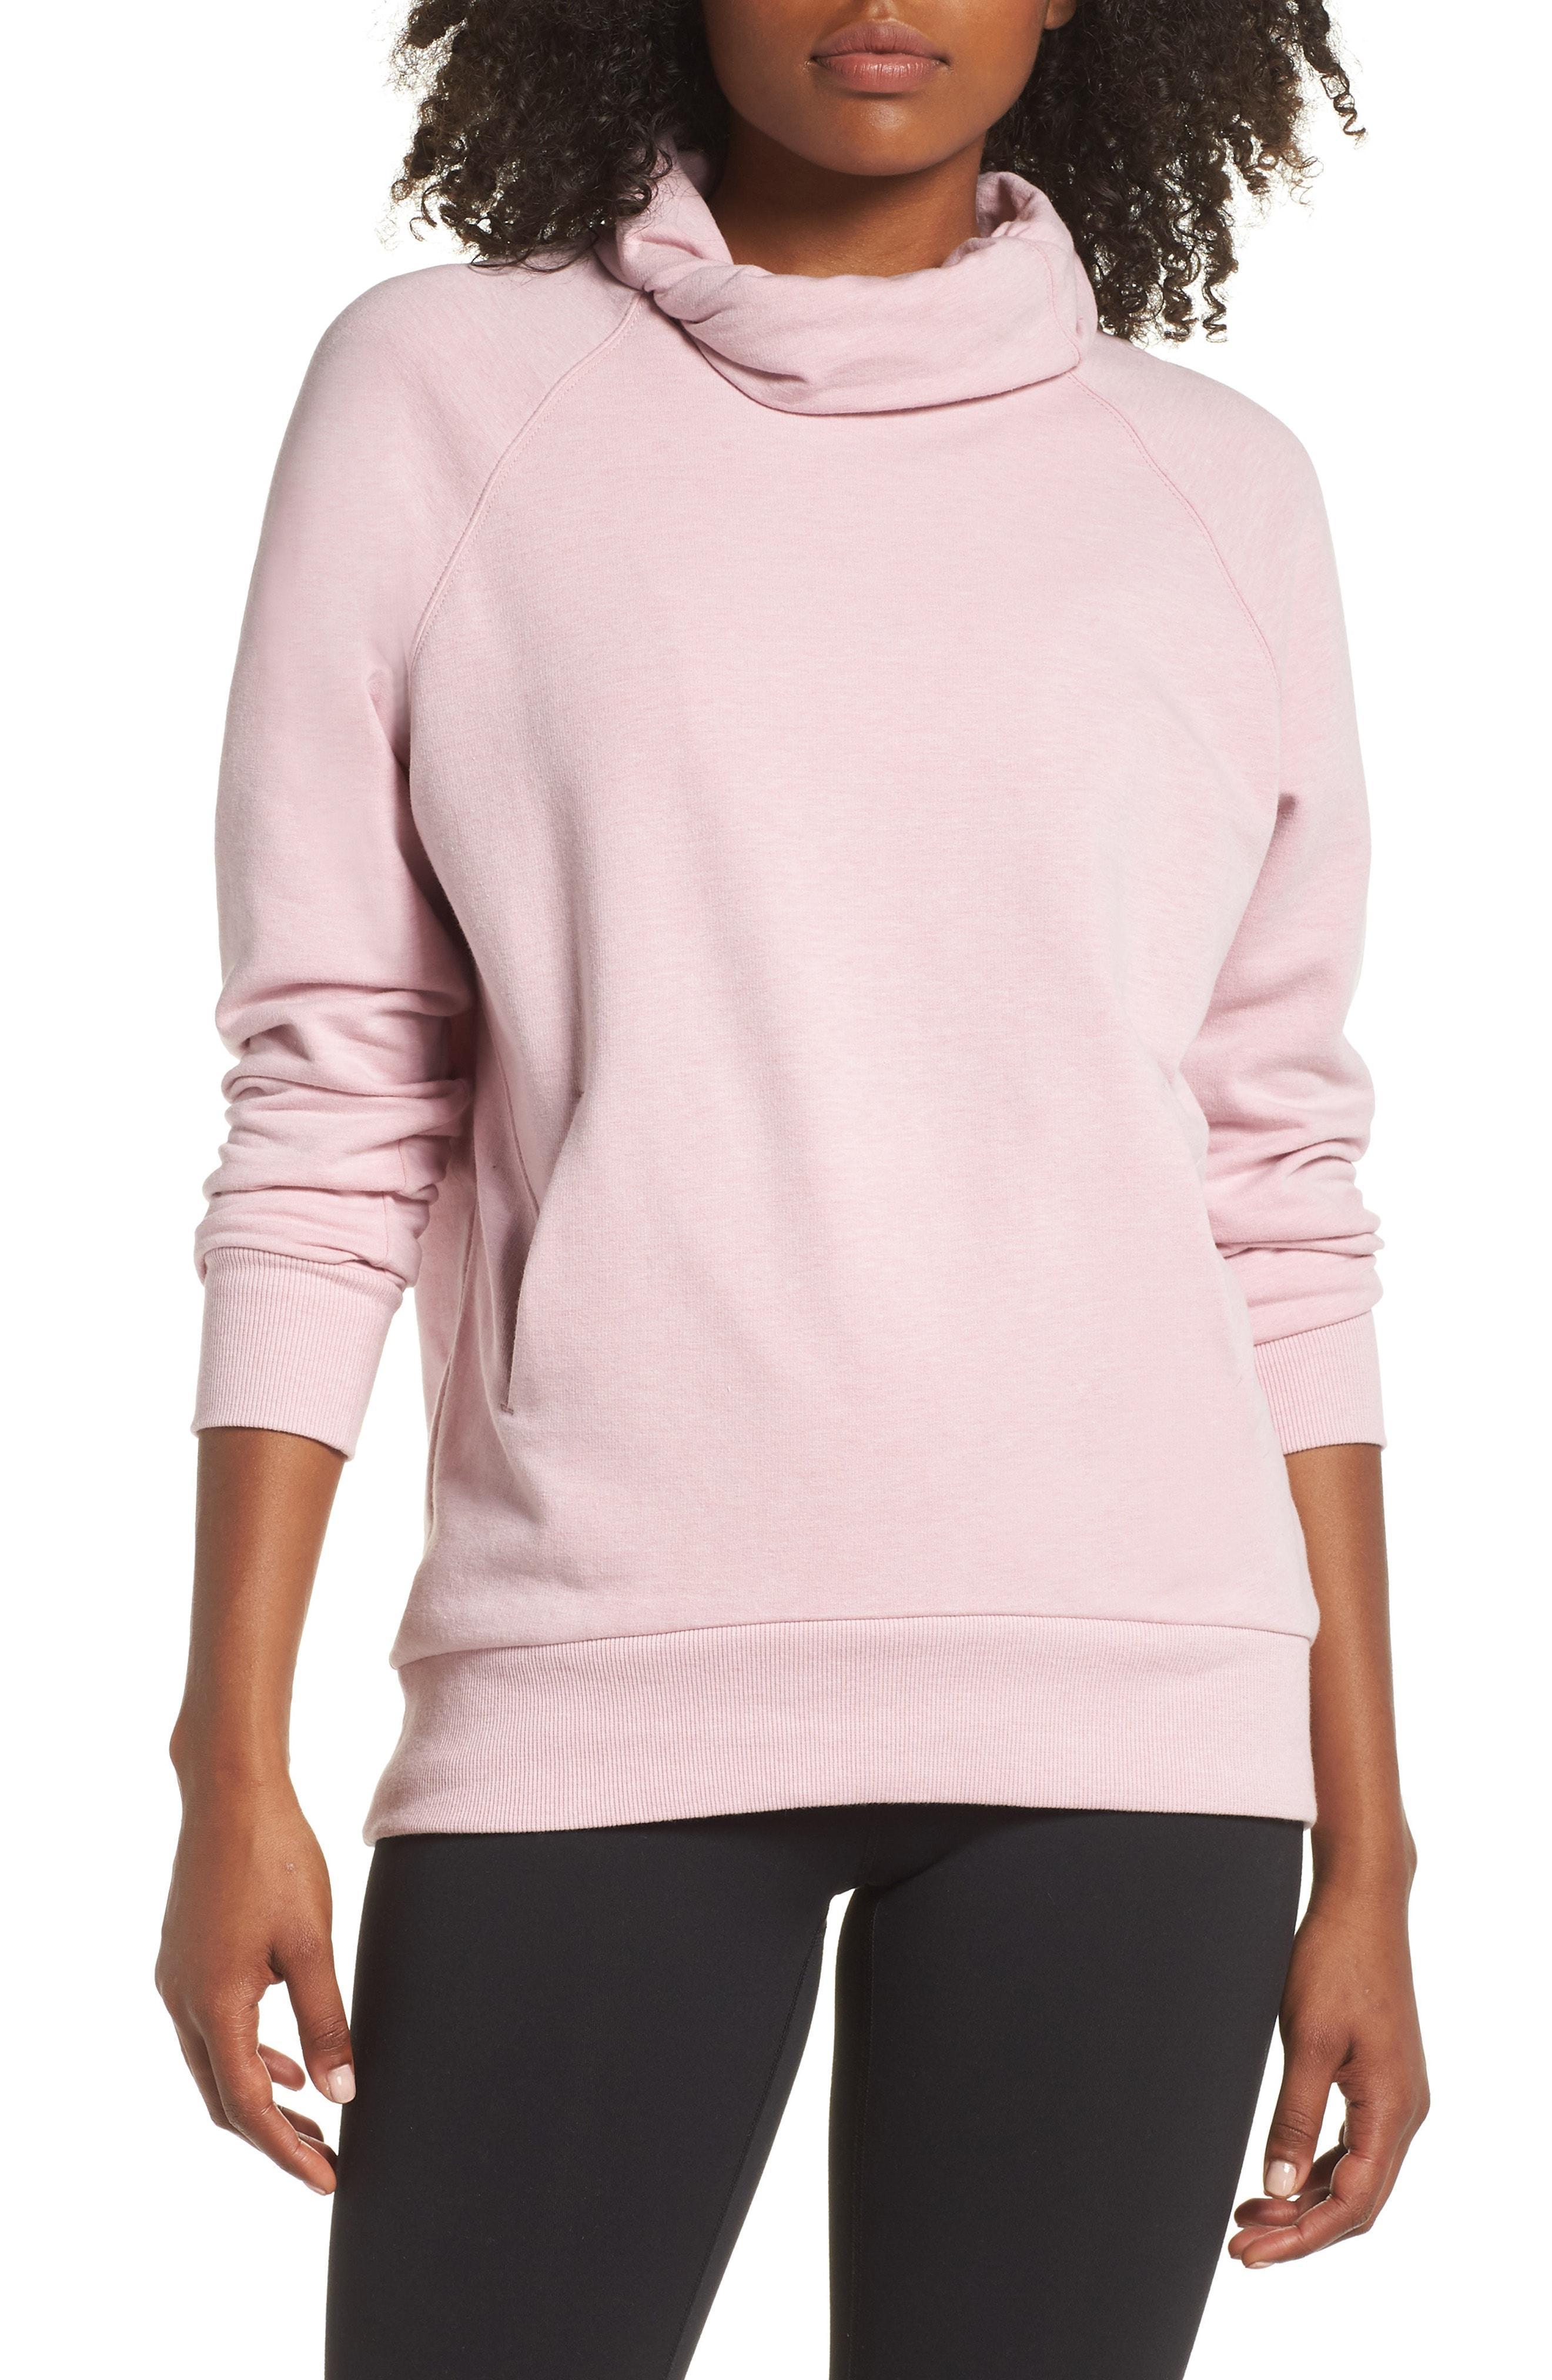 08d3d044780 Lyst - Zella Erica Twist Cowl Neck Pullover in Pink